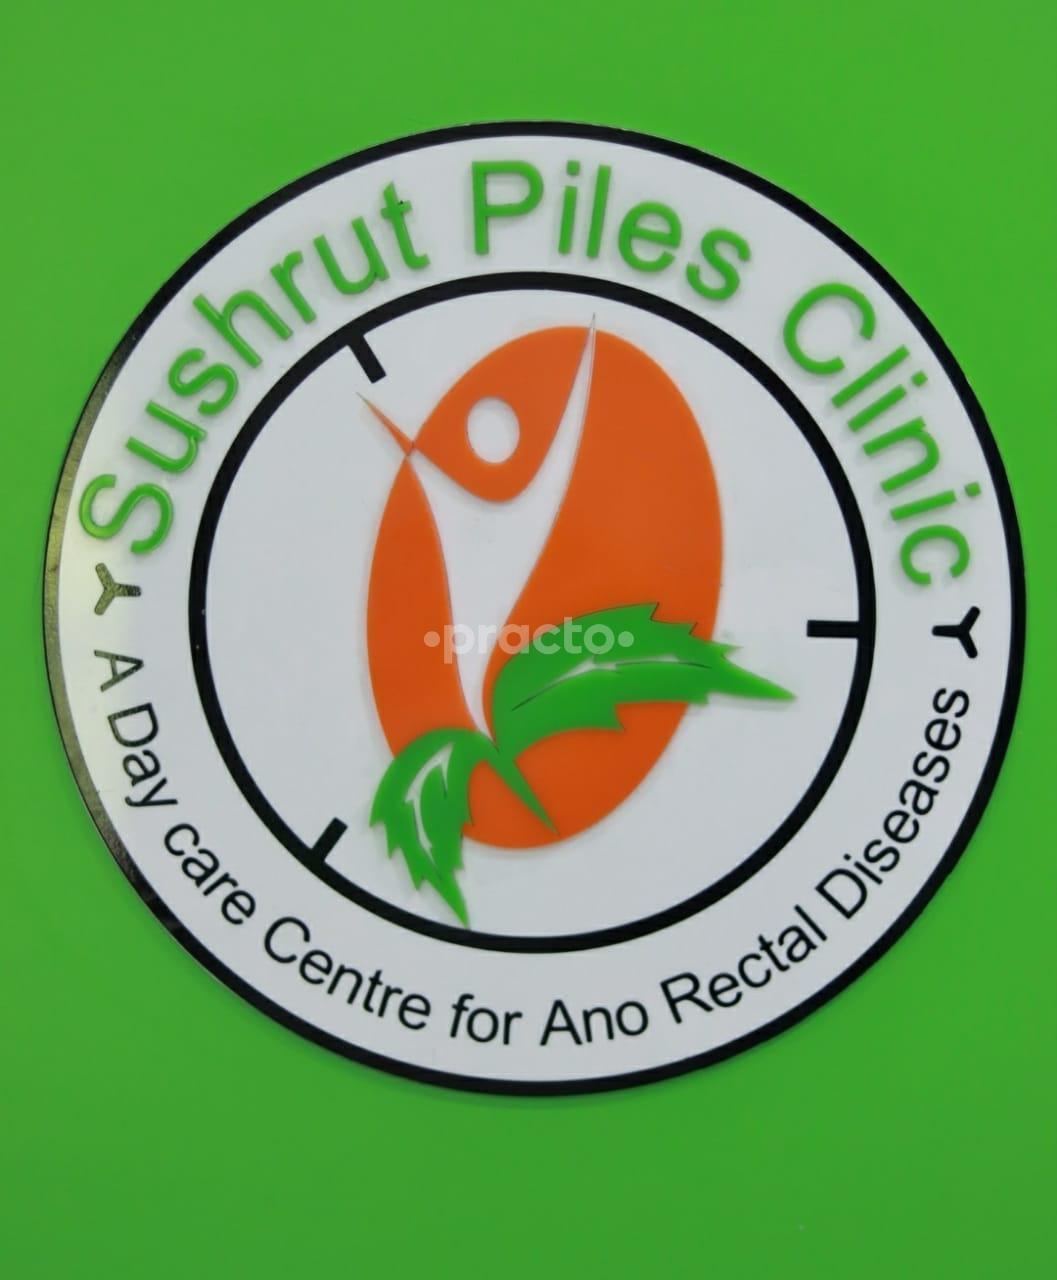 Sushrut Piles Clinic